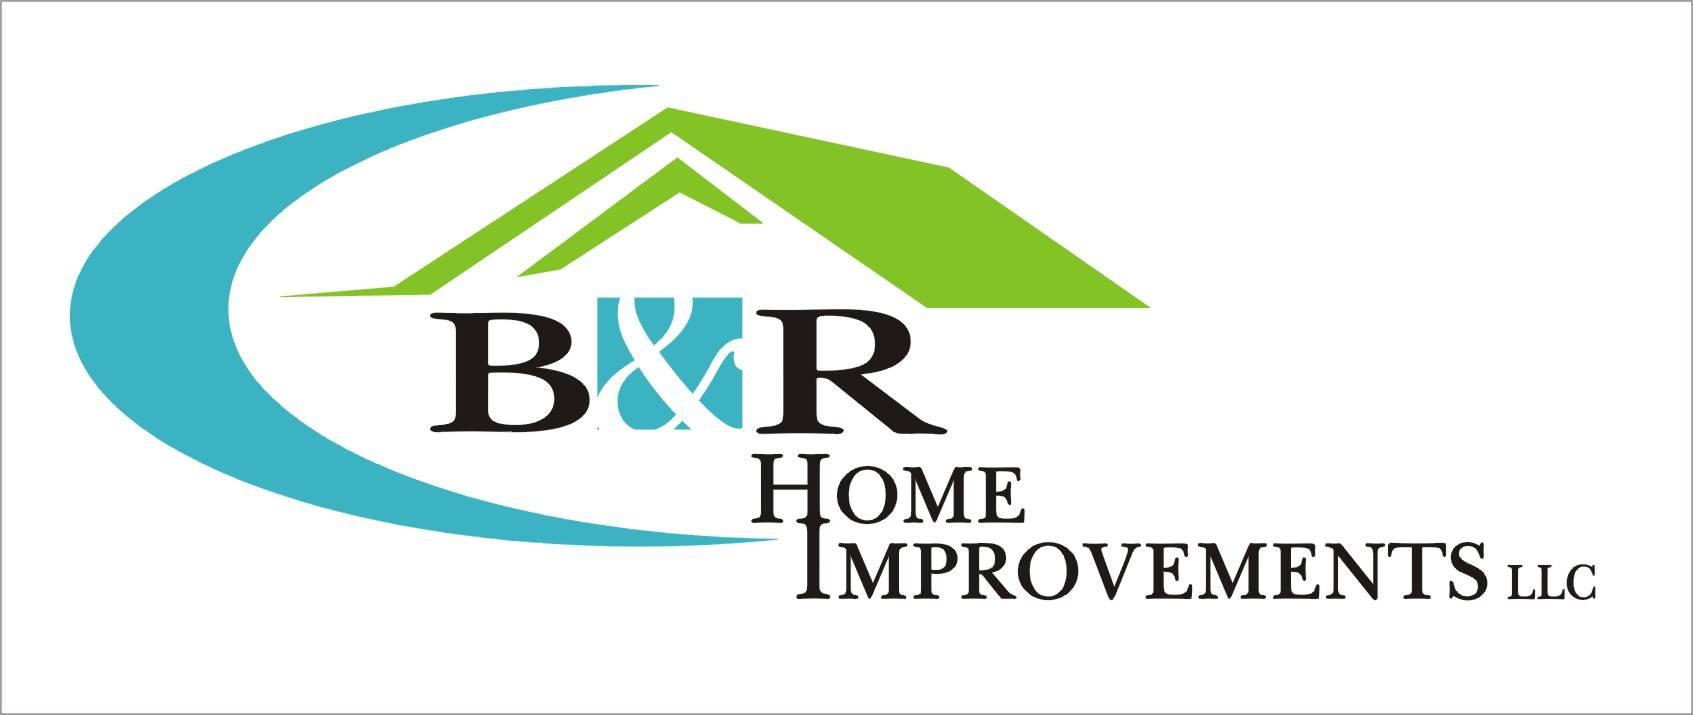 B&R Home Improvements LLC logo